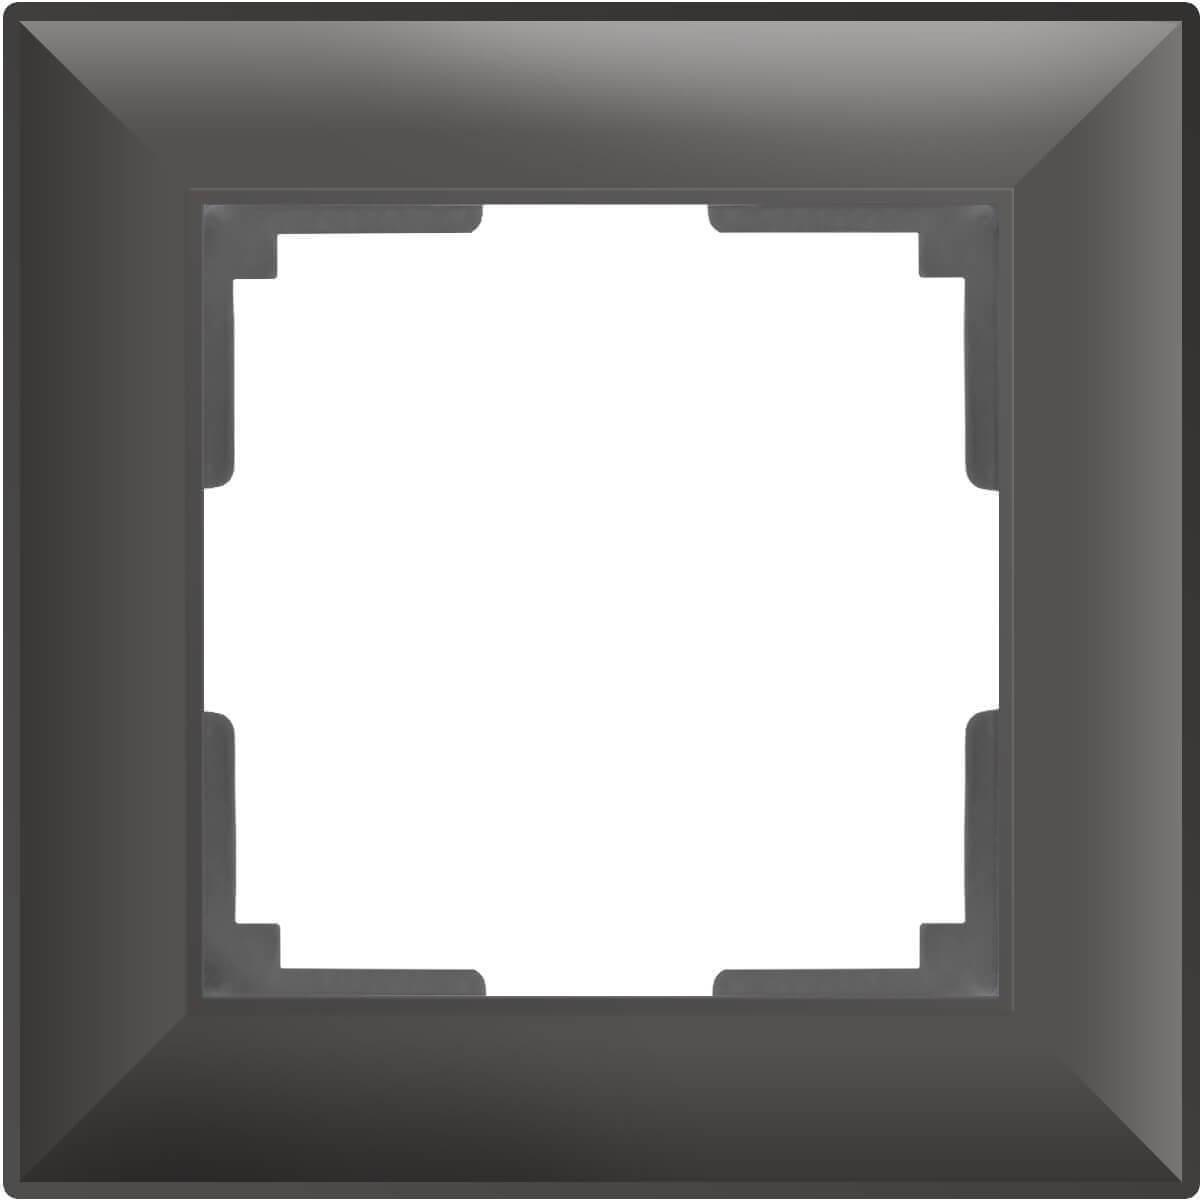 Рамка Werkel Fiore на 1 пост серо-коричневый WL14-Frame-01 4690389109058